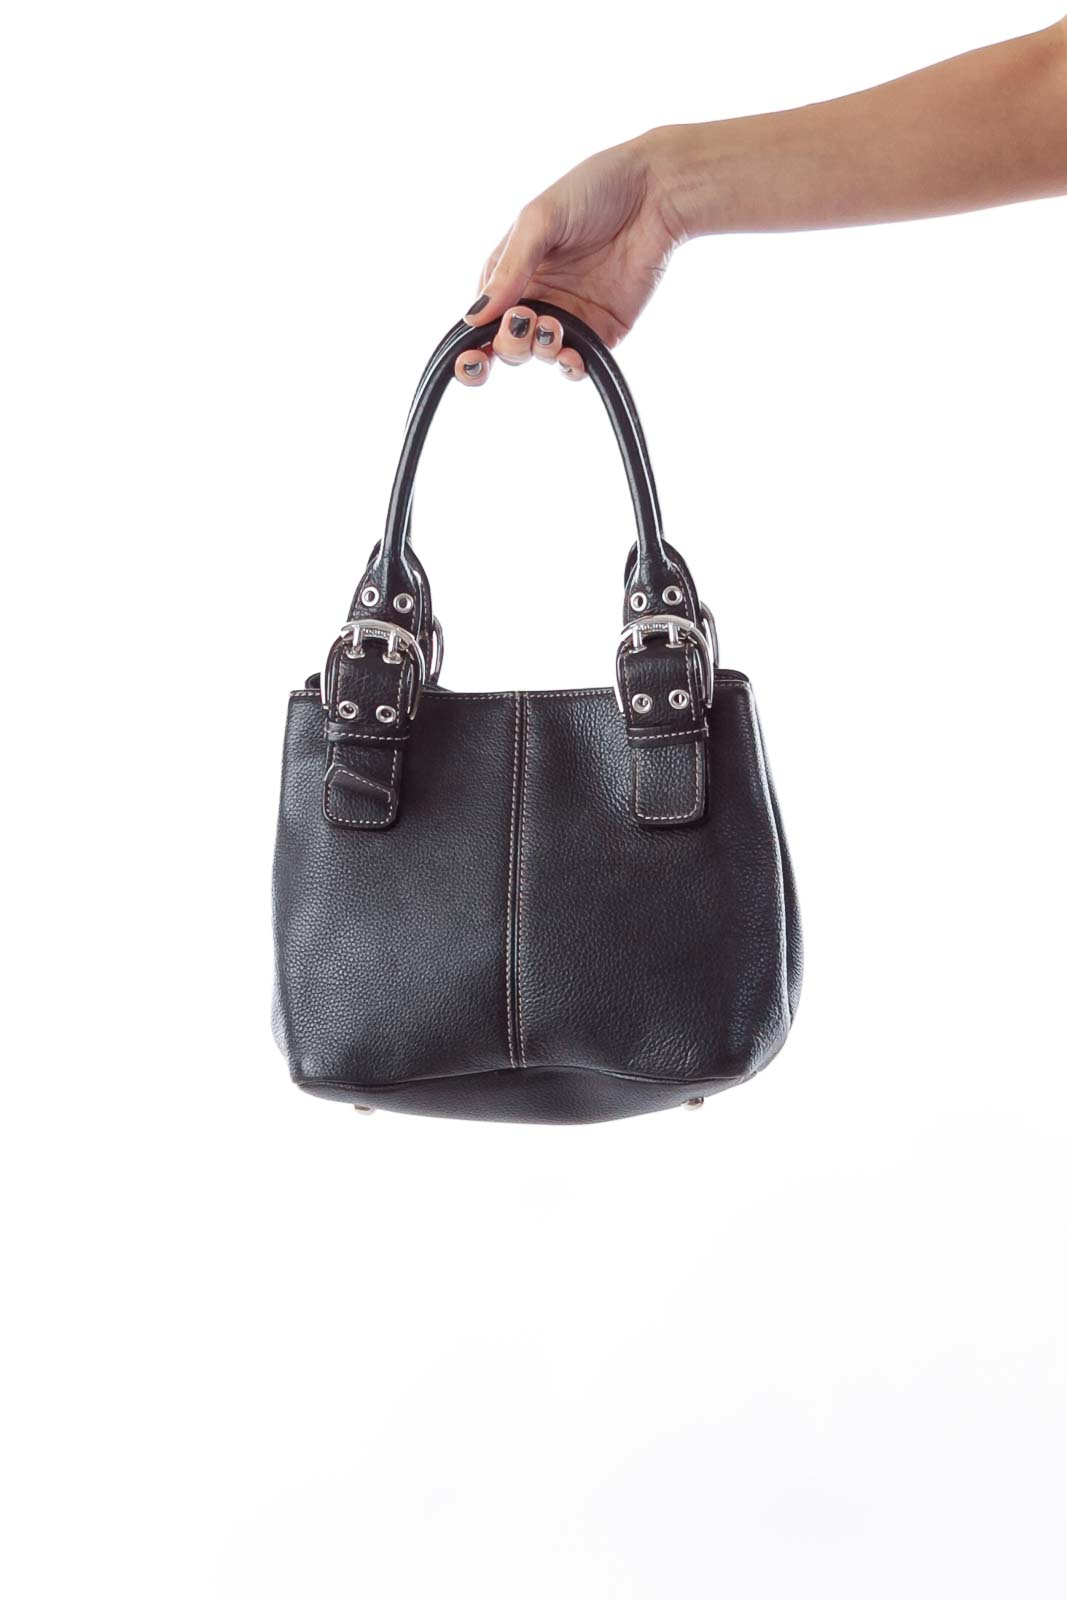 Black Mini Leather Bag Front